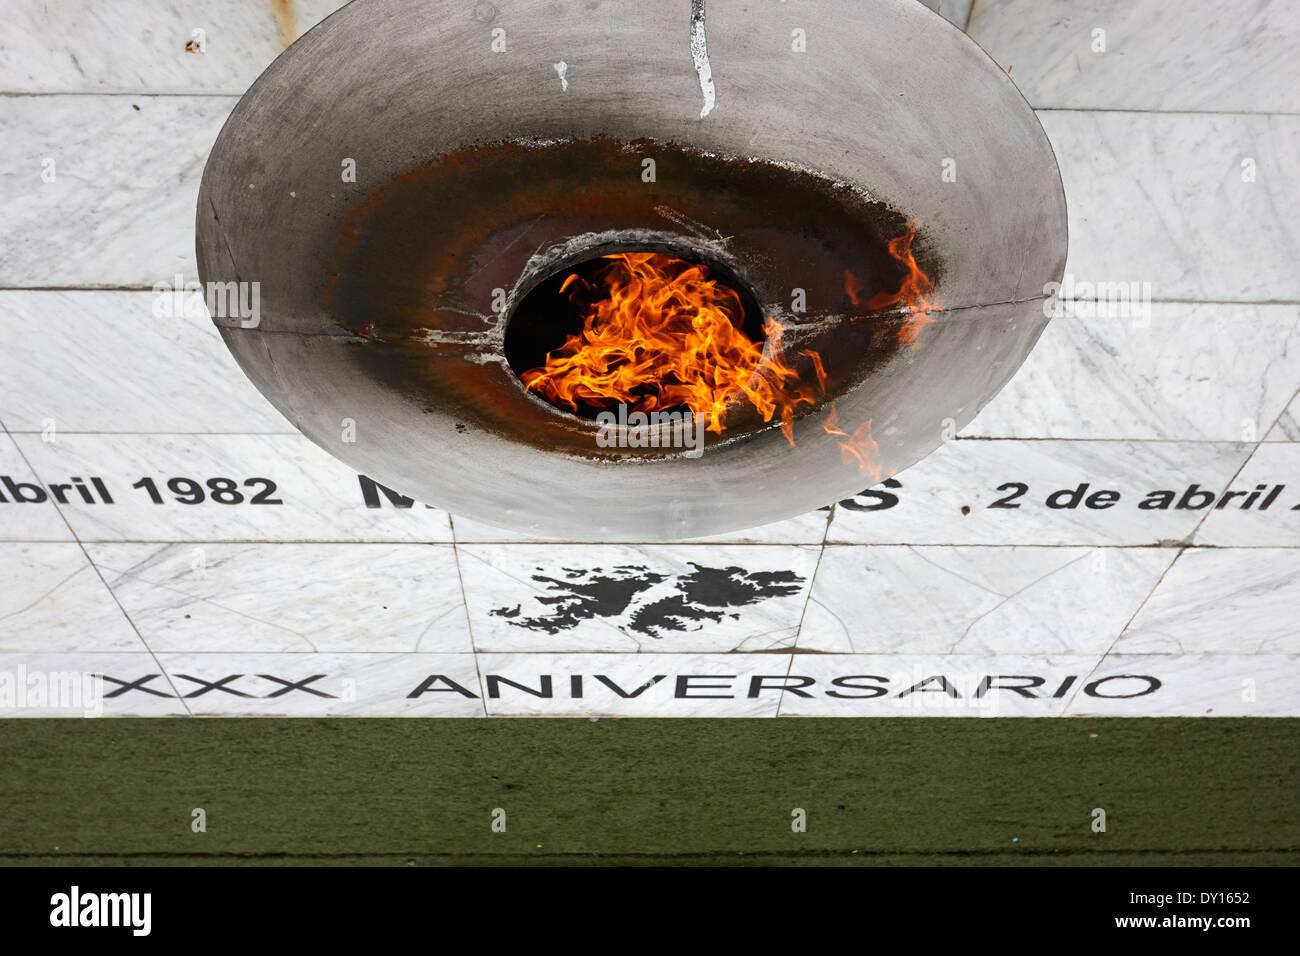 eternal flame islas malvinas war memorial ushuaia argentina - Stock Image